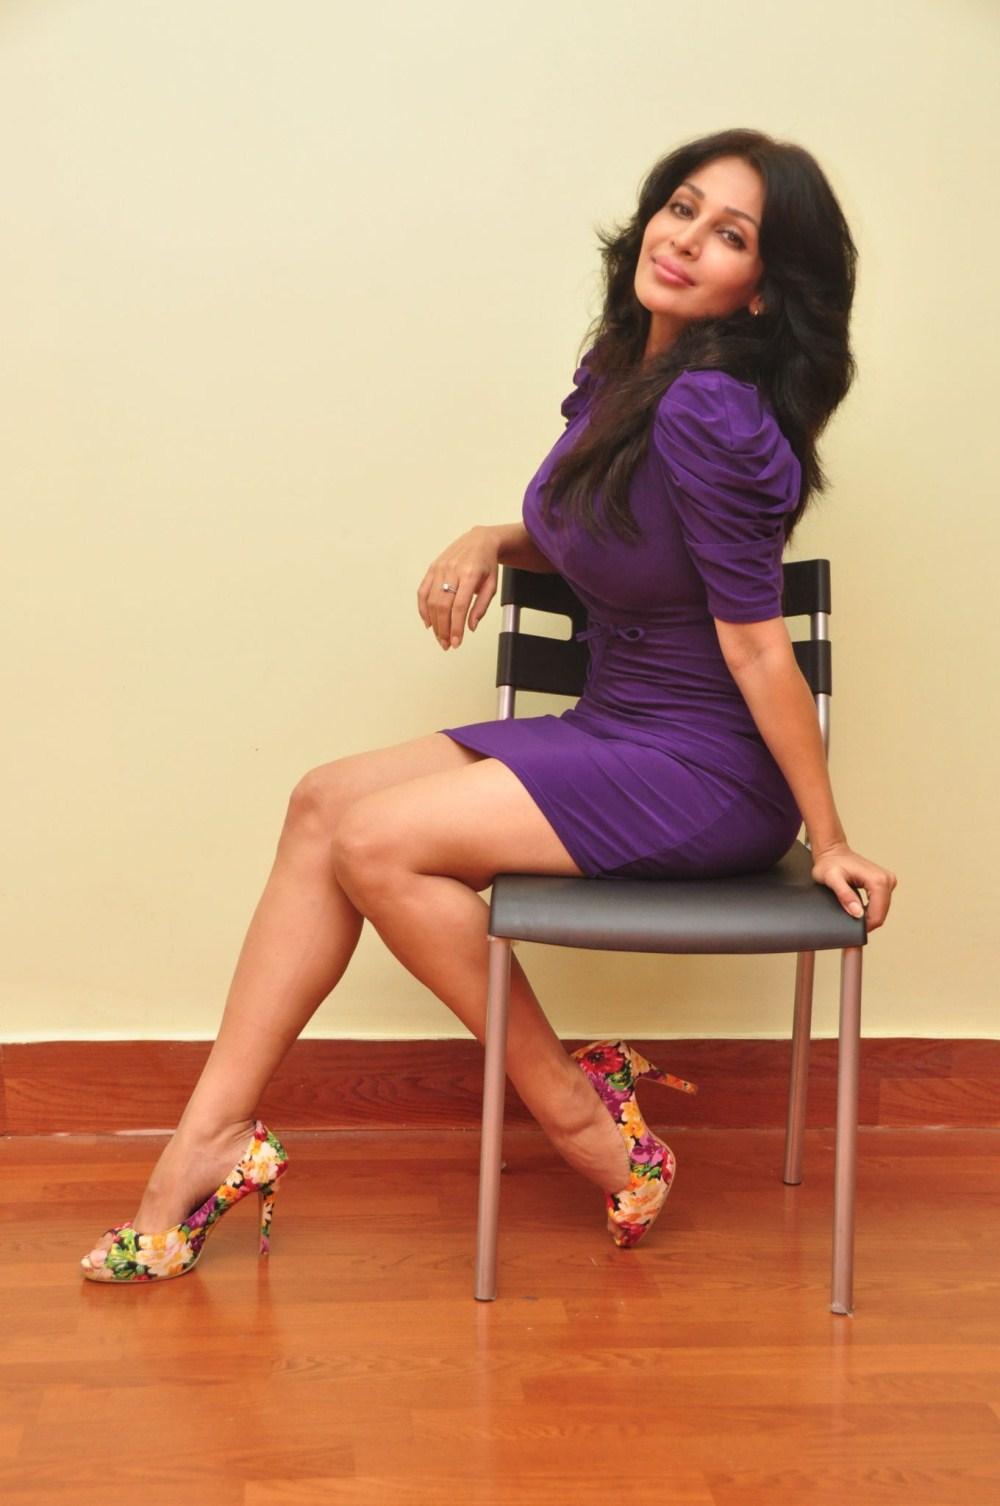 Cute fairy beauty asha saini photo-shoot